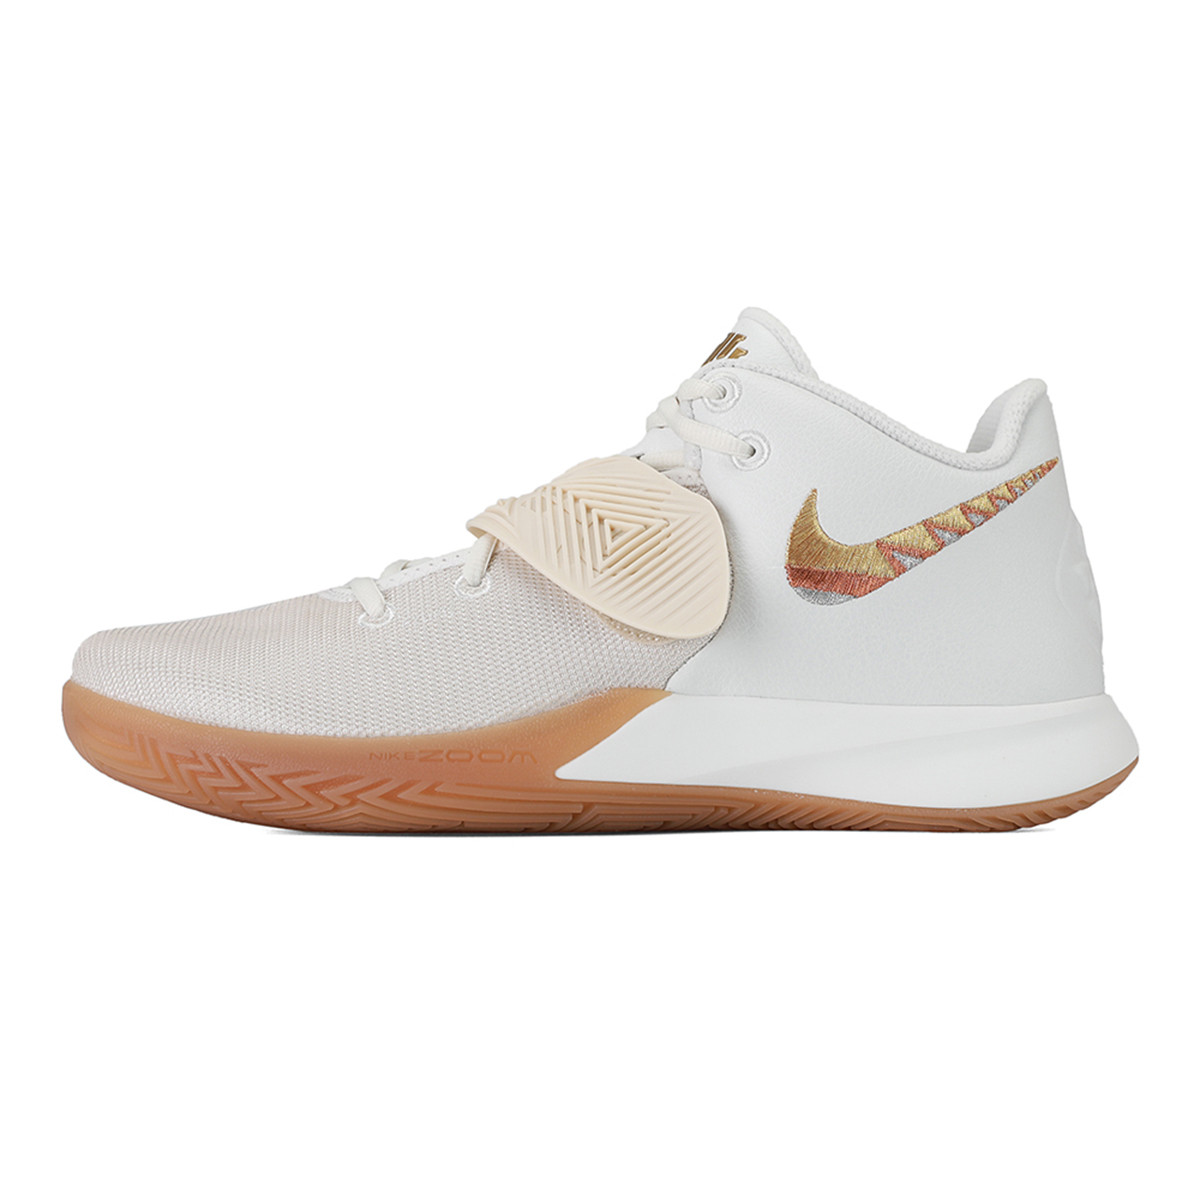 NIKE 耐克 KYRIE FLYTRAP III 篮球男鞋